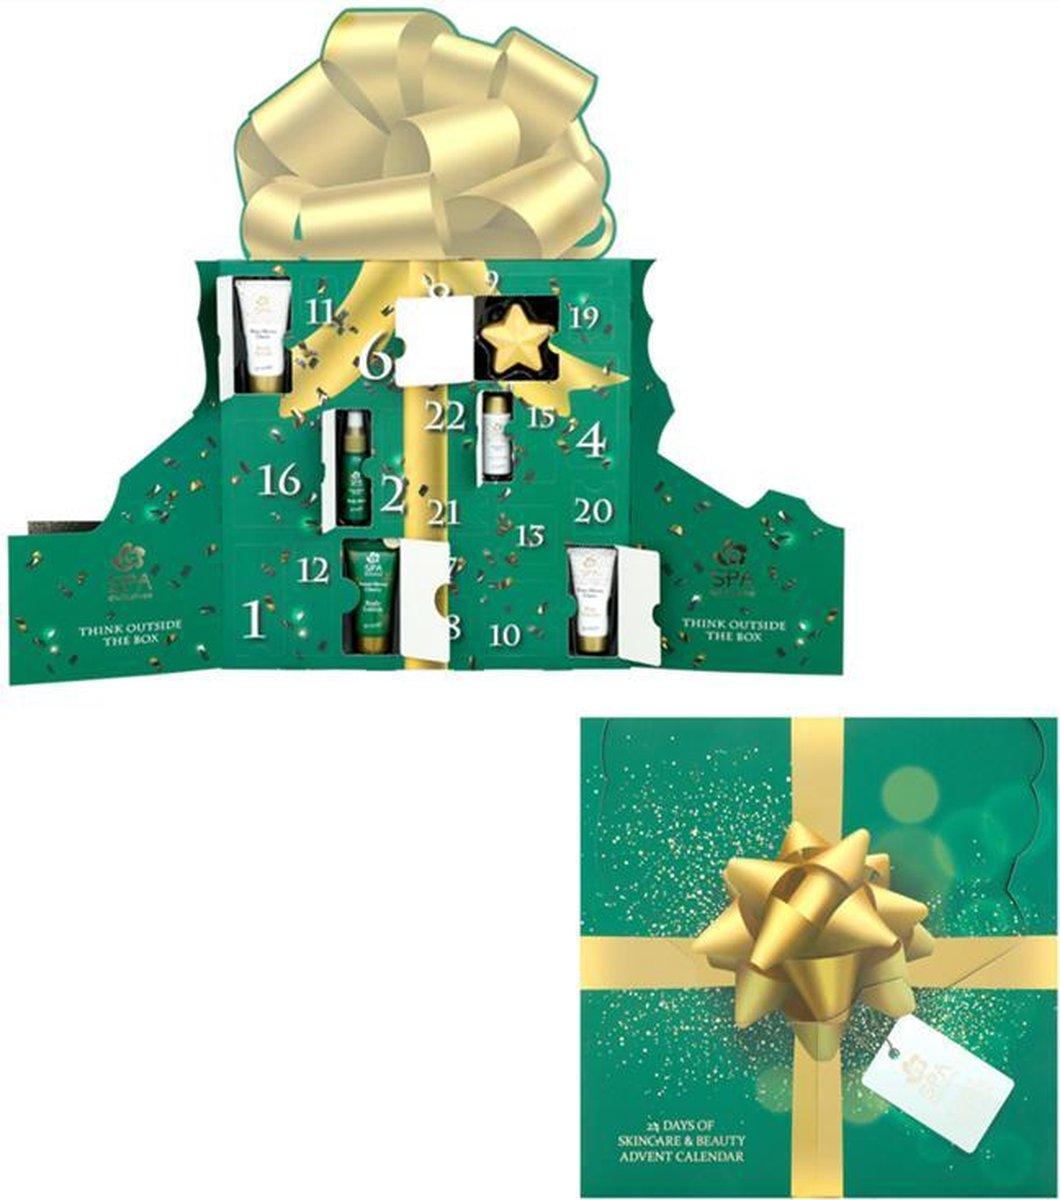 Spa Exclusives adventskalender 2021 - geschenkset vrouwen